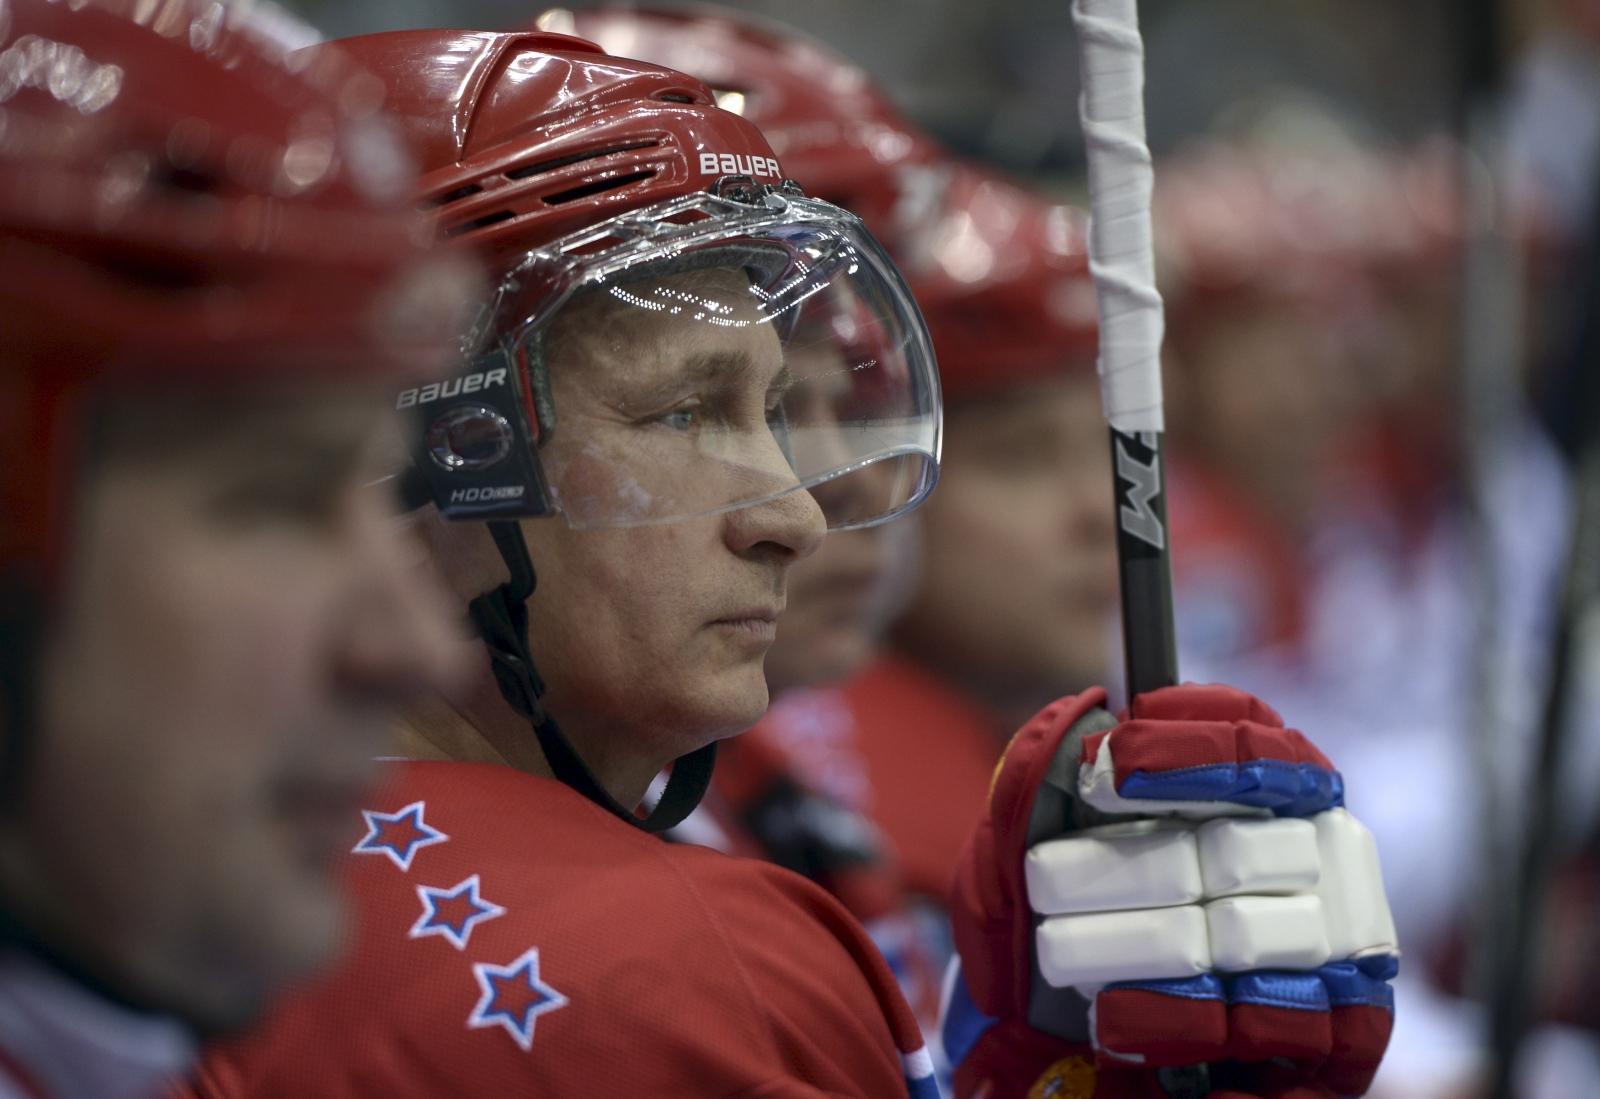 Putin ice hockey